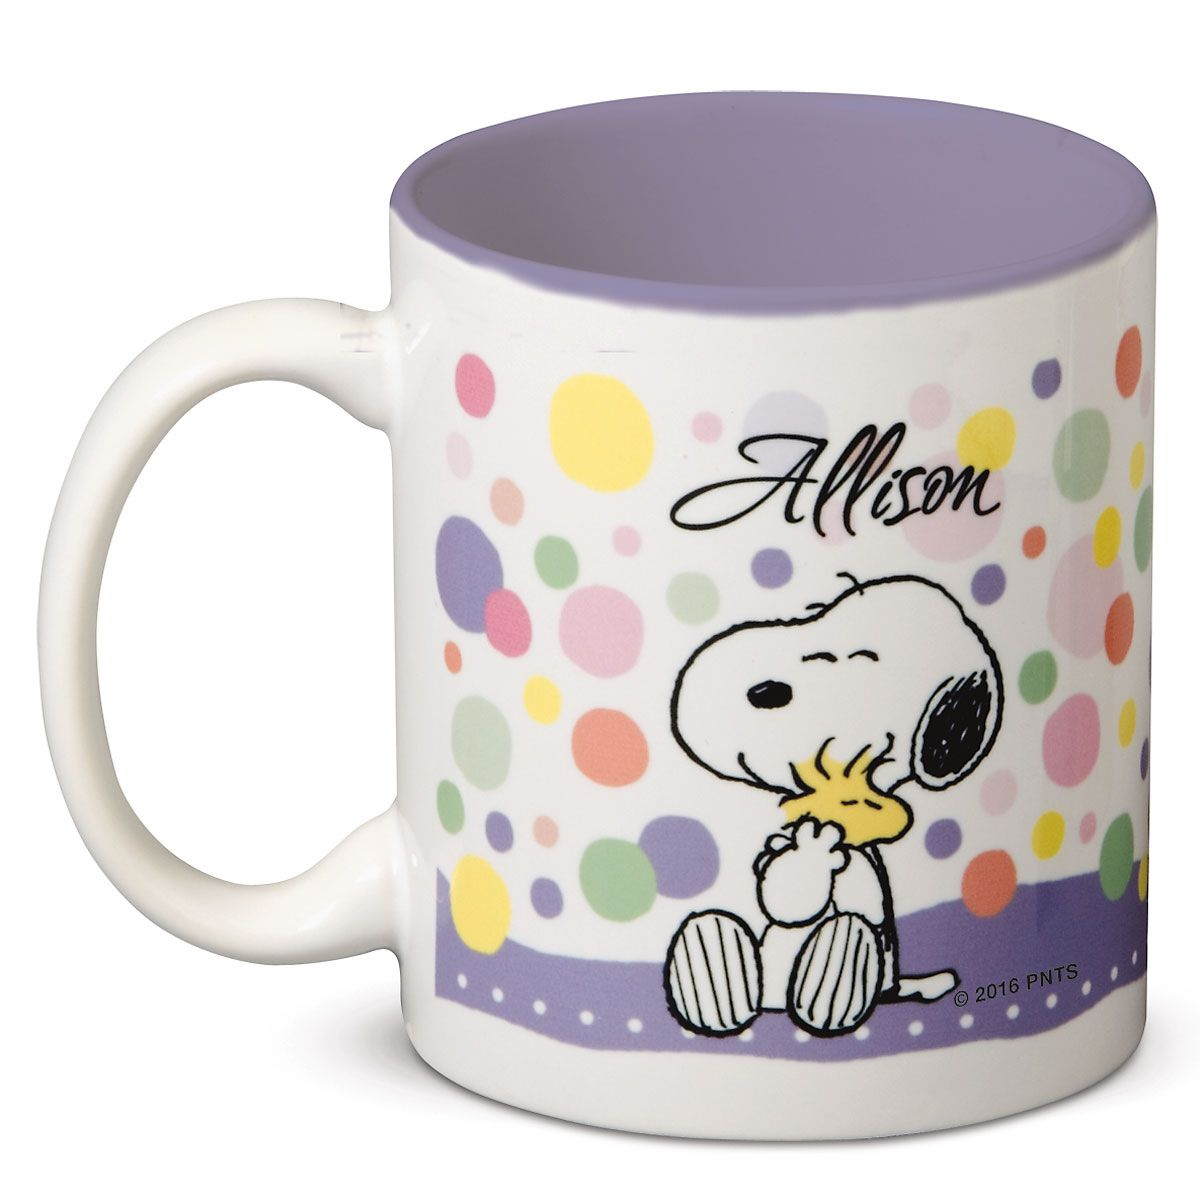 PEANUTS Personalized Mug Current Catalog